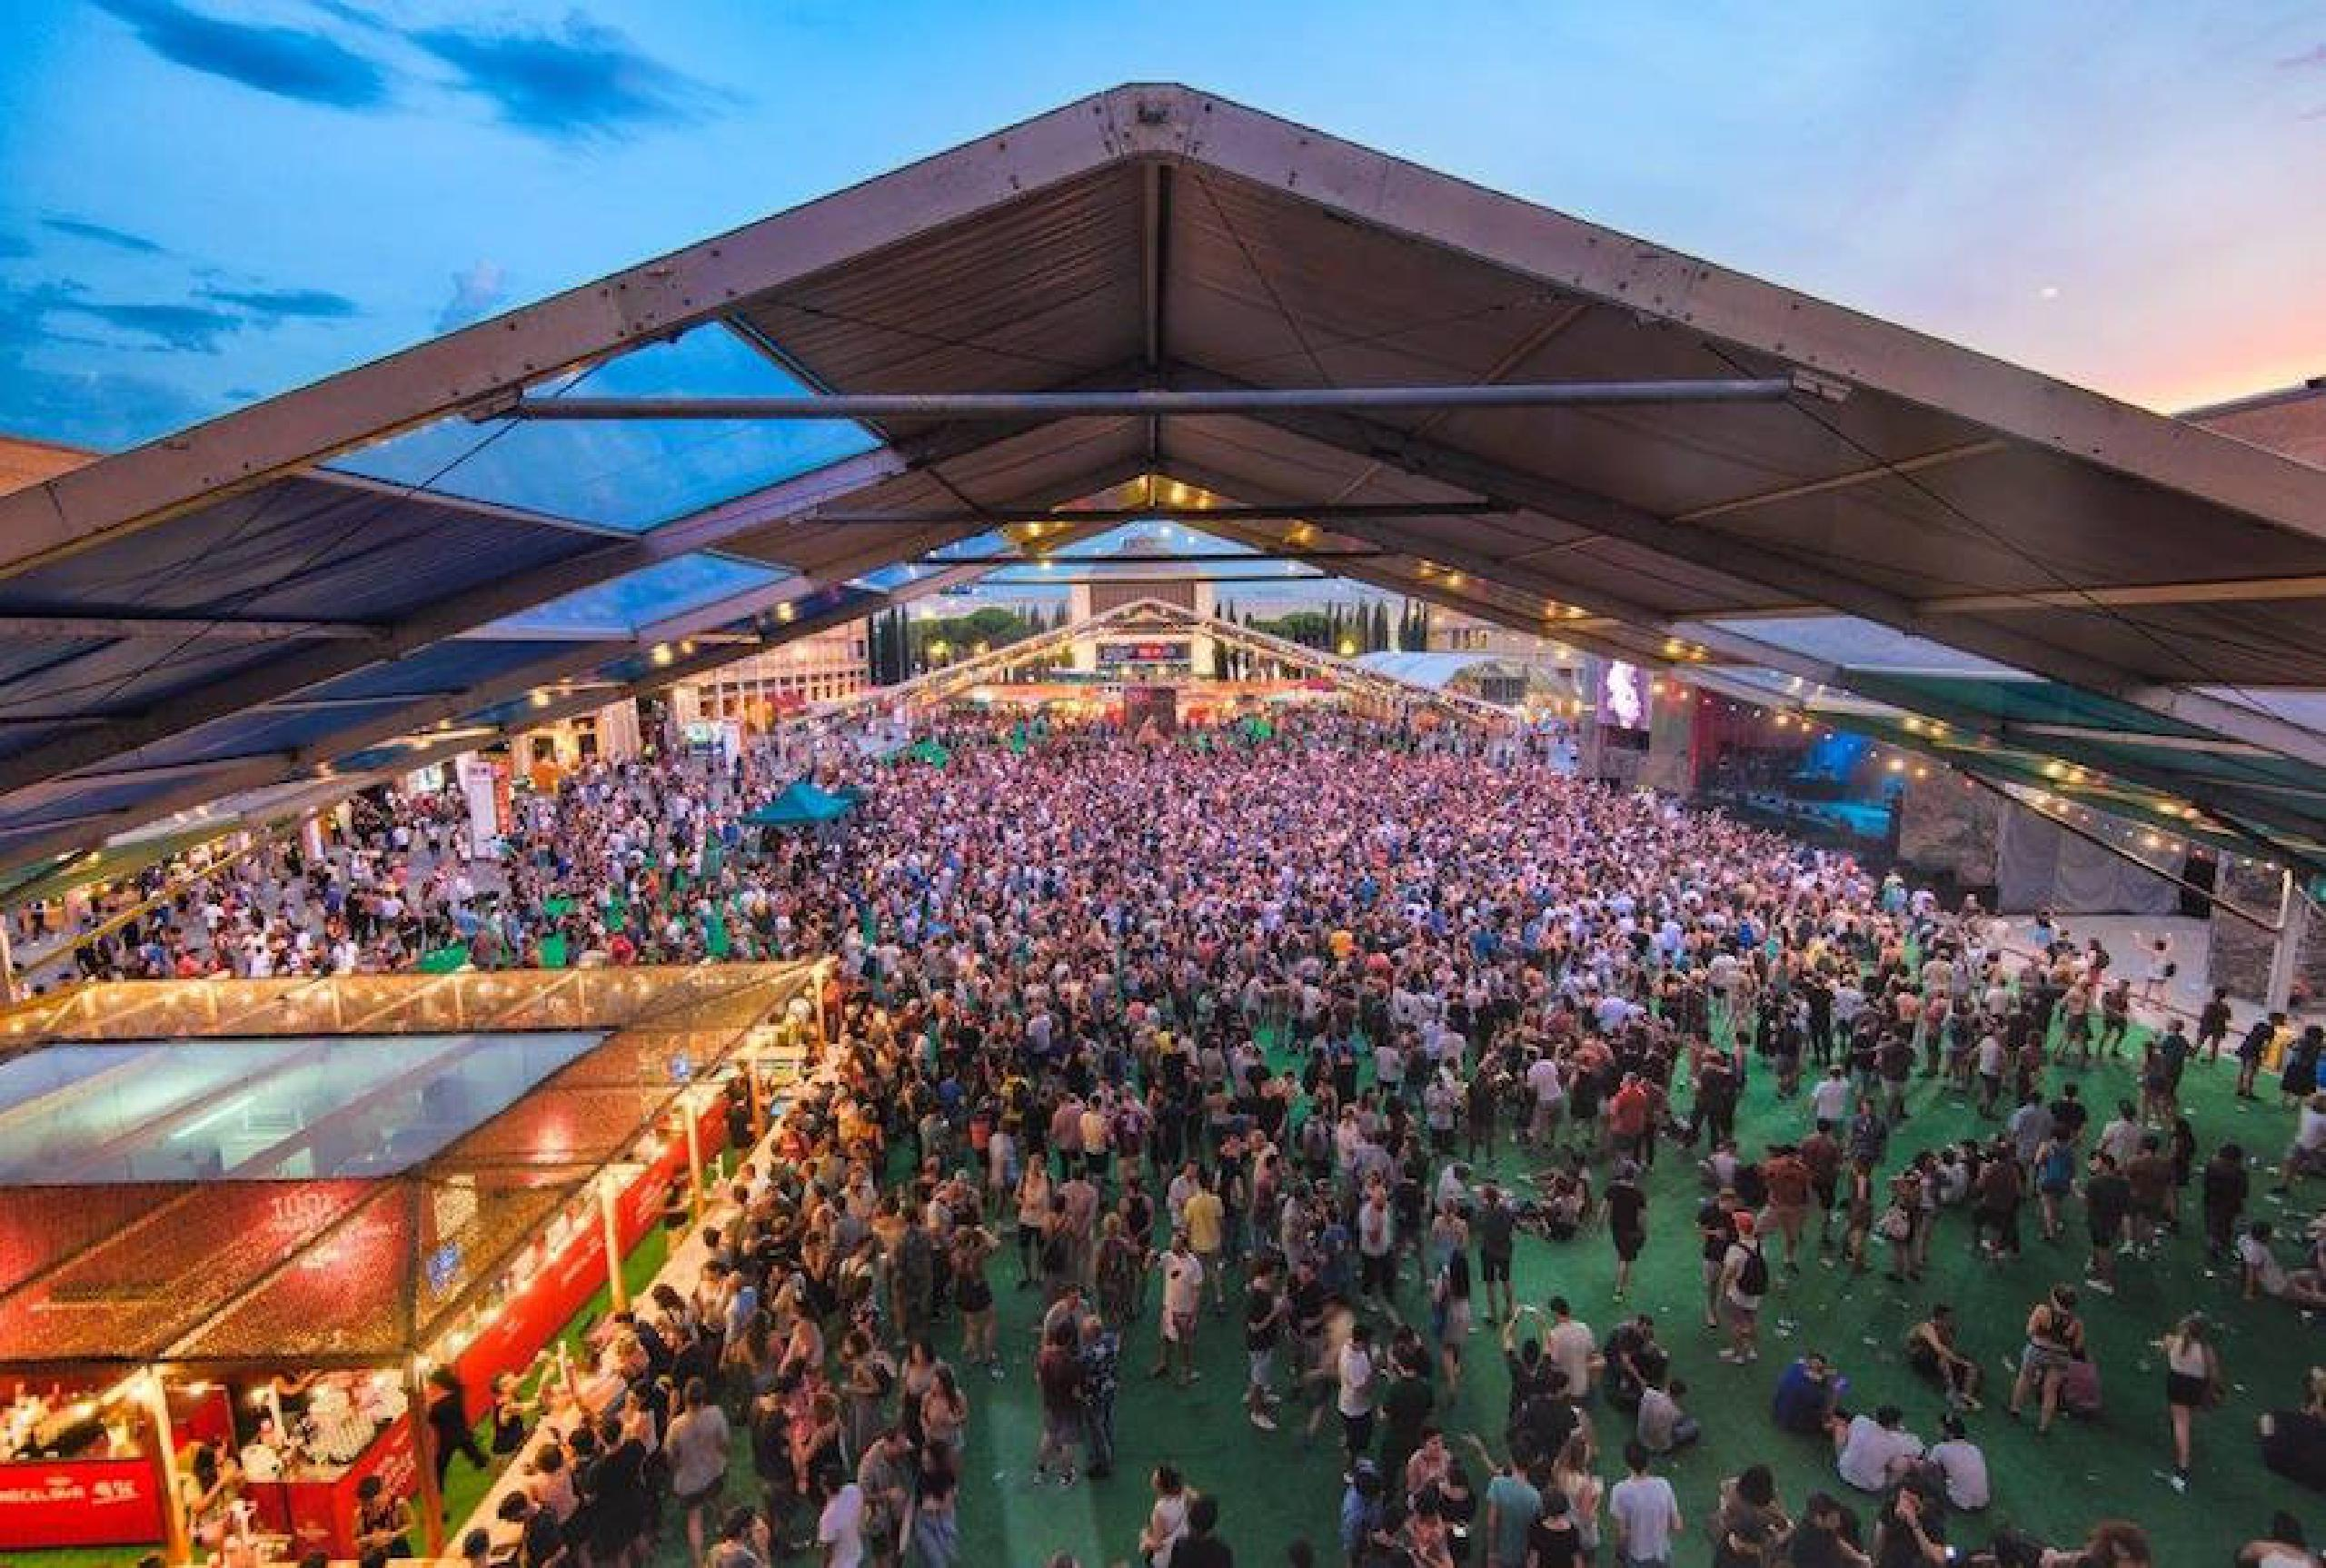 Festivales de música en verano 2018 en España 1